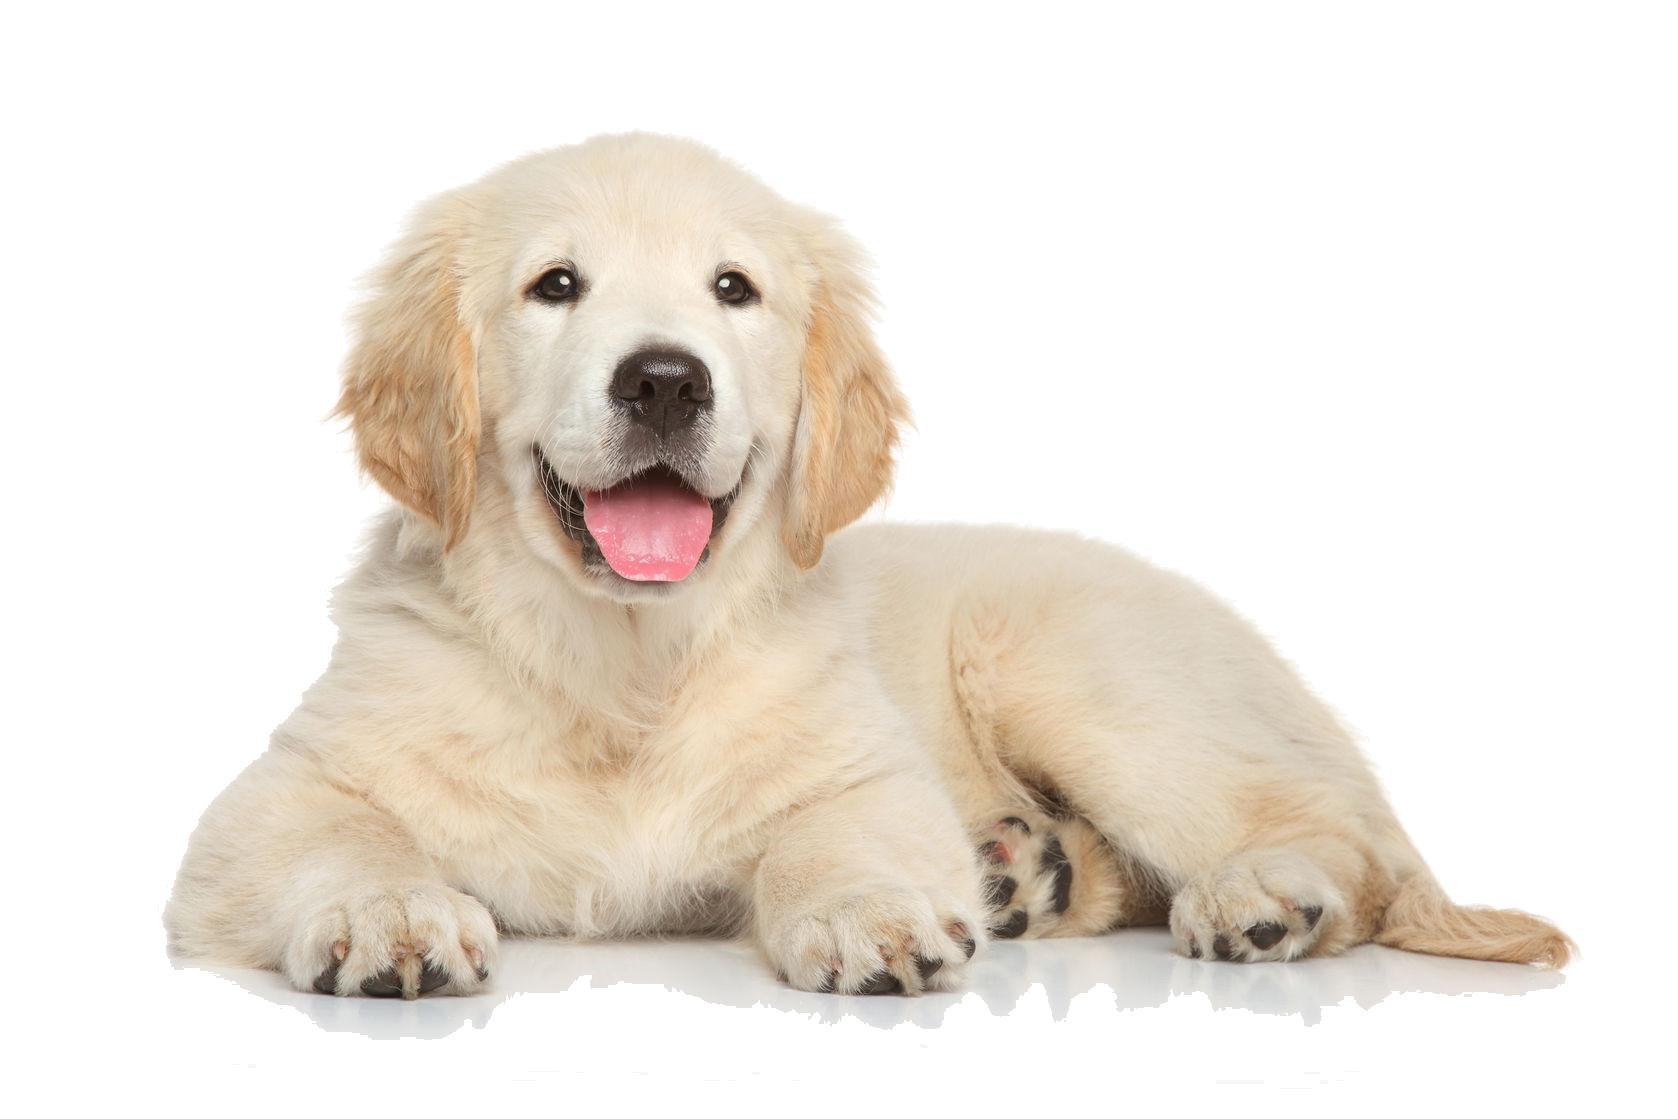 golden retriever puppy file hq png image freepngimg